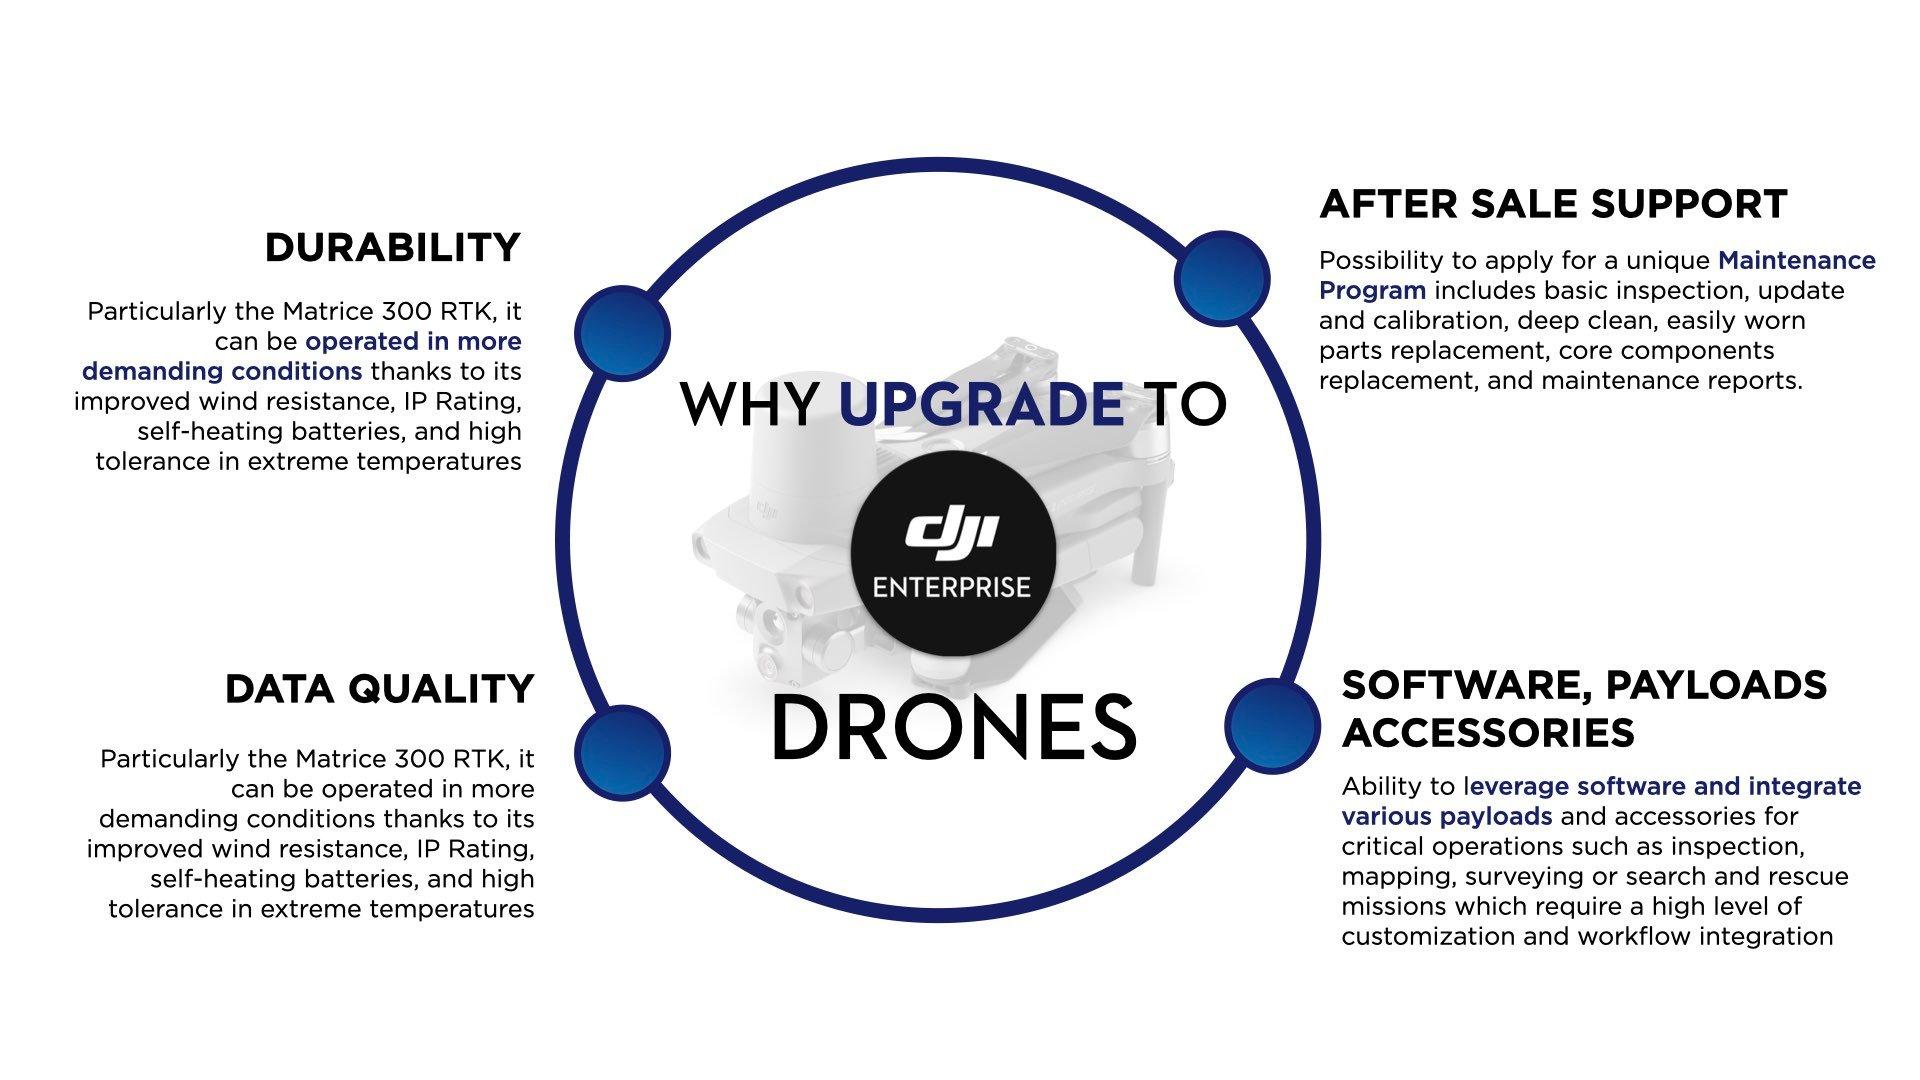 Why Upgrade to DJI Enterprise drones